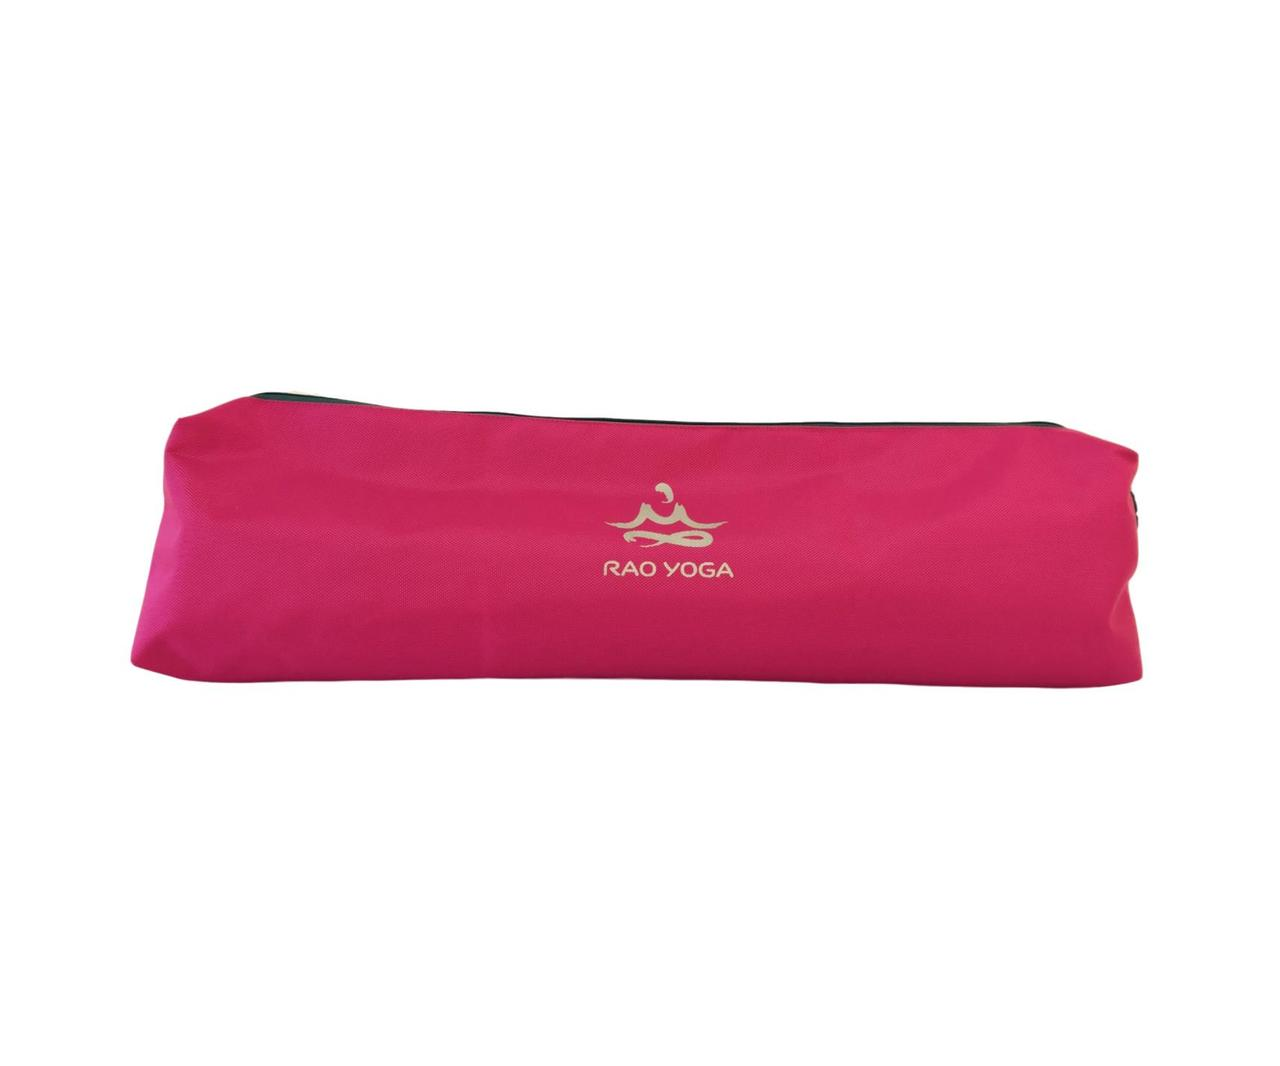 Сумка-чехол для йога-мата  RAO Классик 65 х 25 см Розовый (hub_Sahc33594)